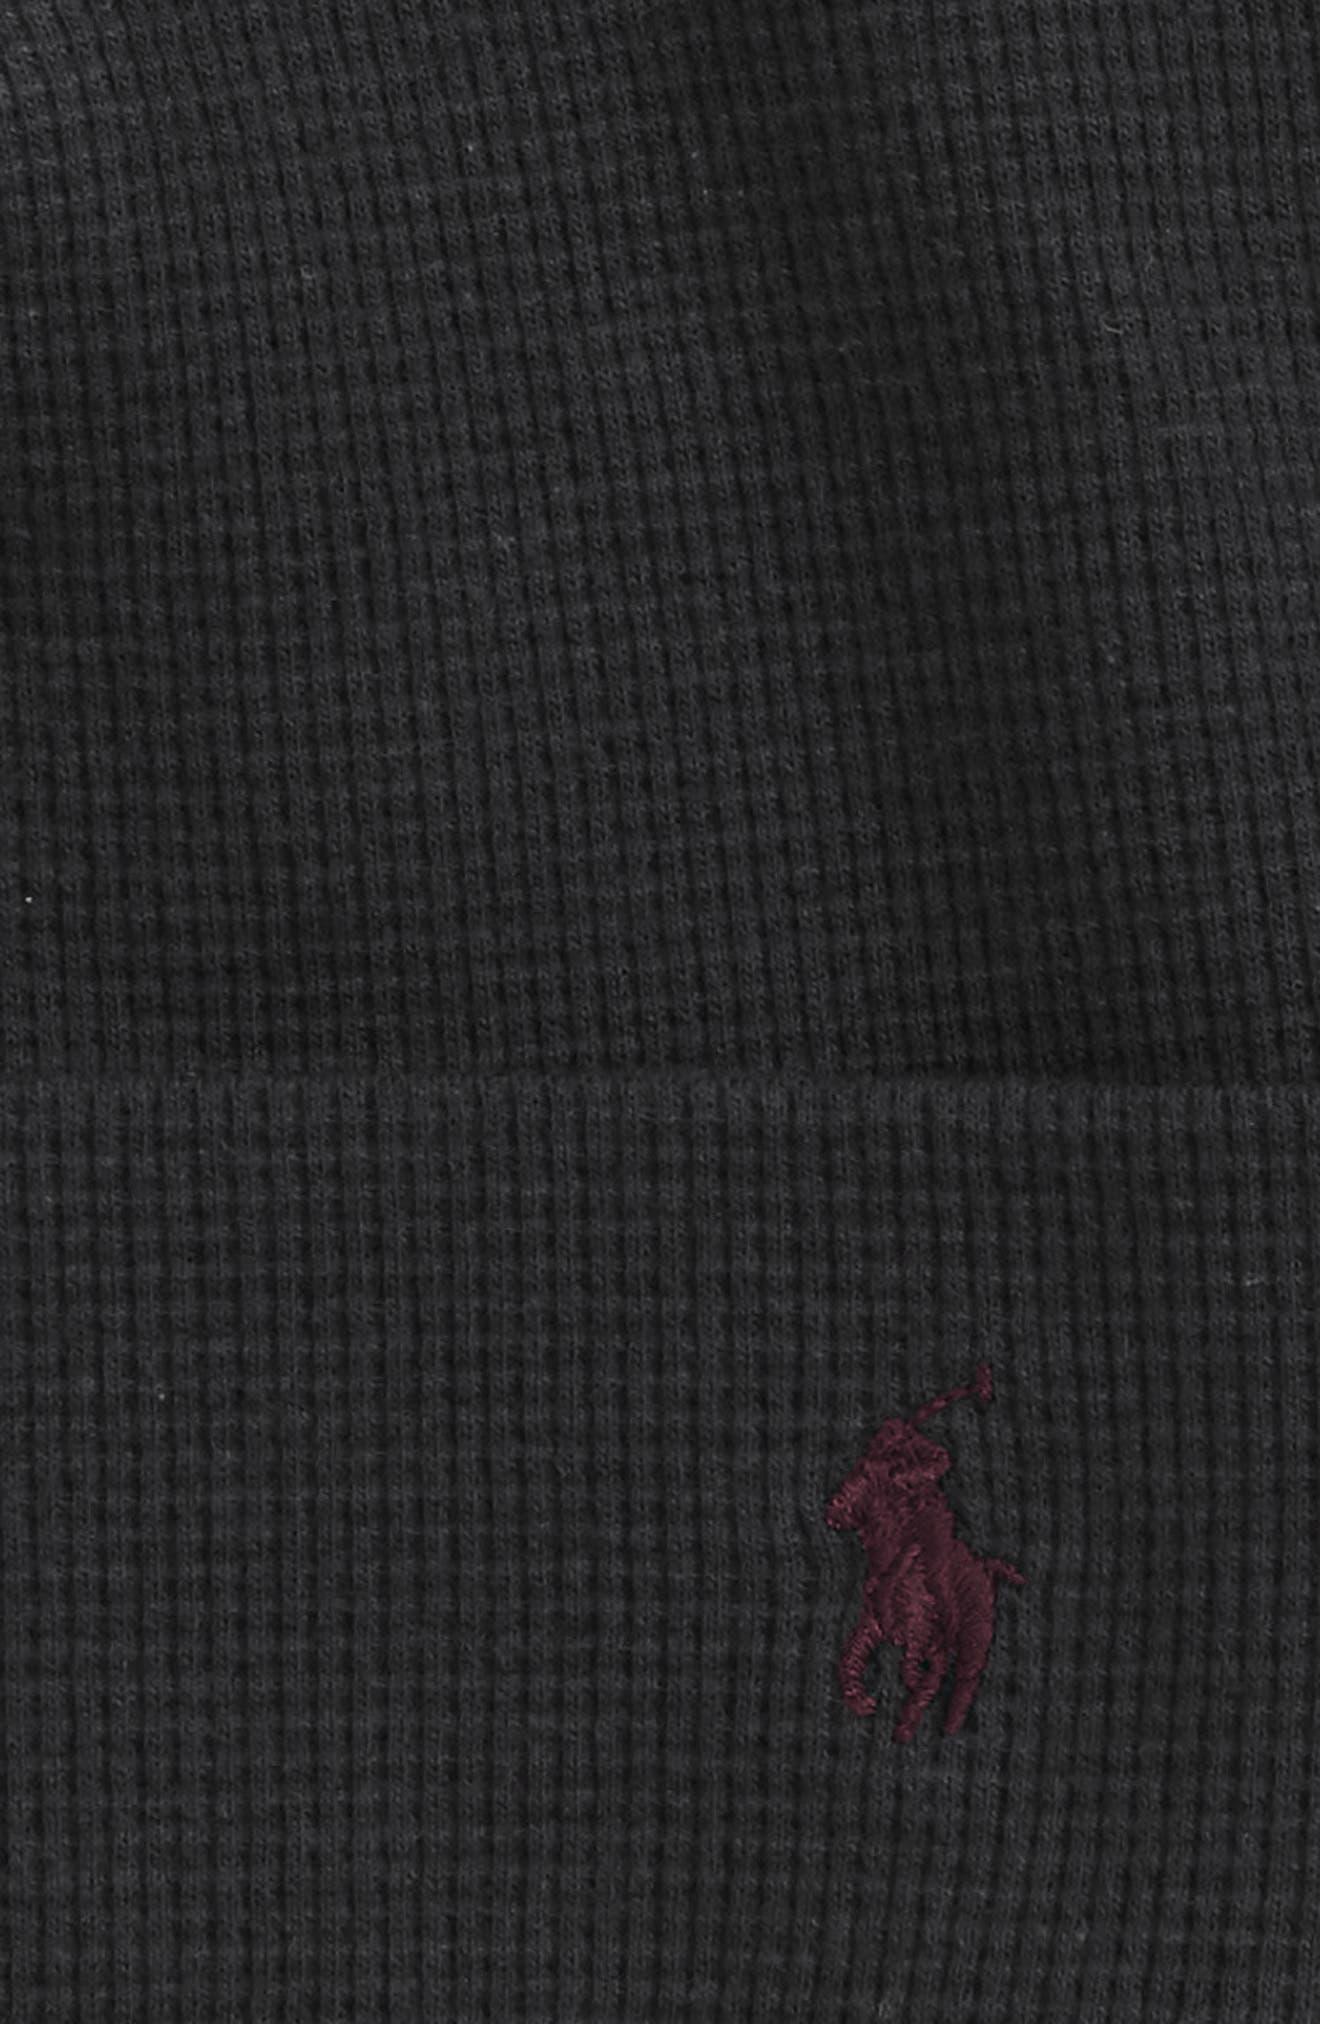 Thermal Cuff Cotton Cap,                             Alternate thumbnail 2, color,                             POLO BLACK